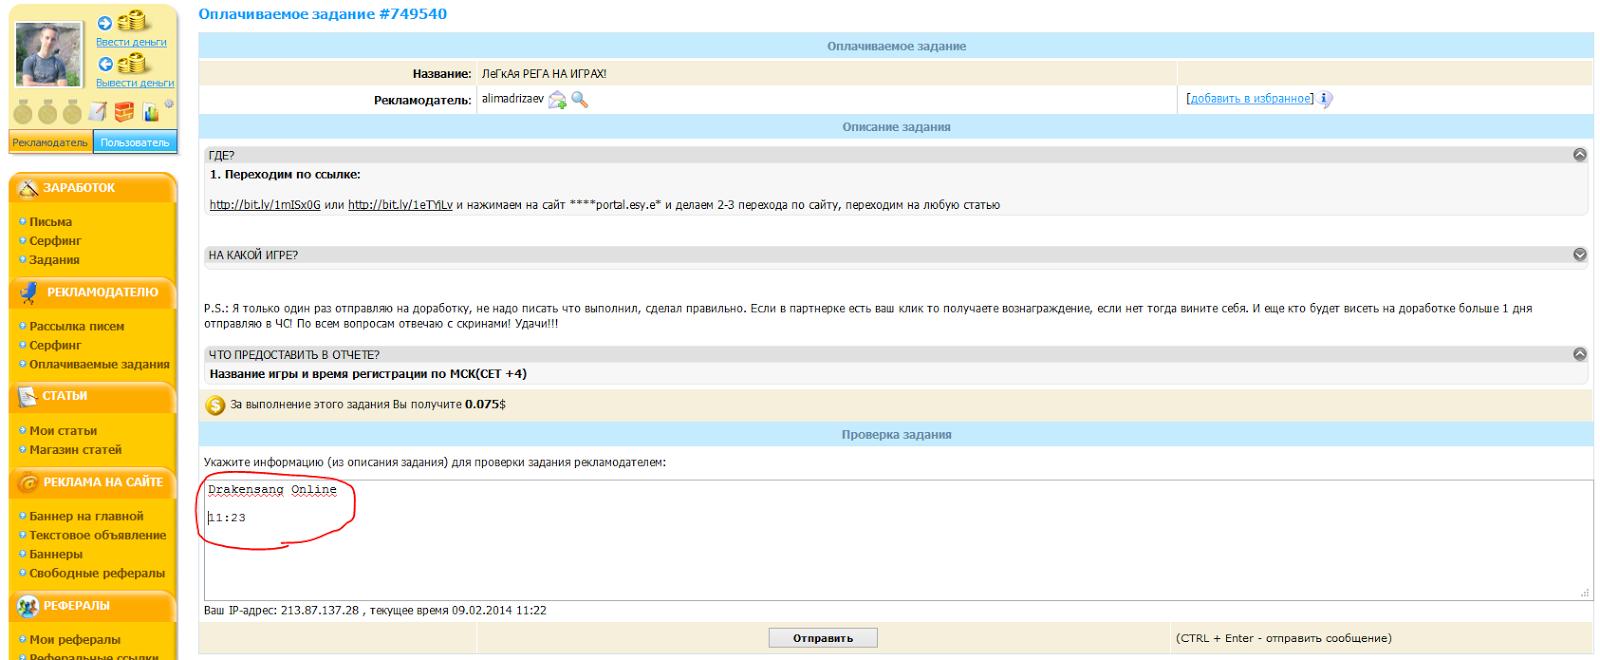 Заработок на выполнении заданий в Буксах (на примере WMMail)